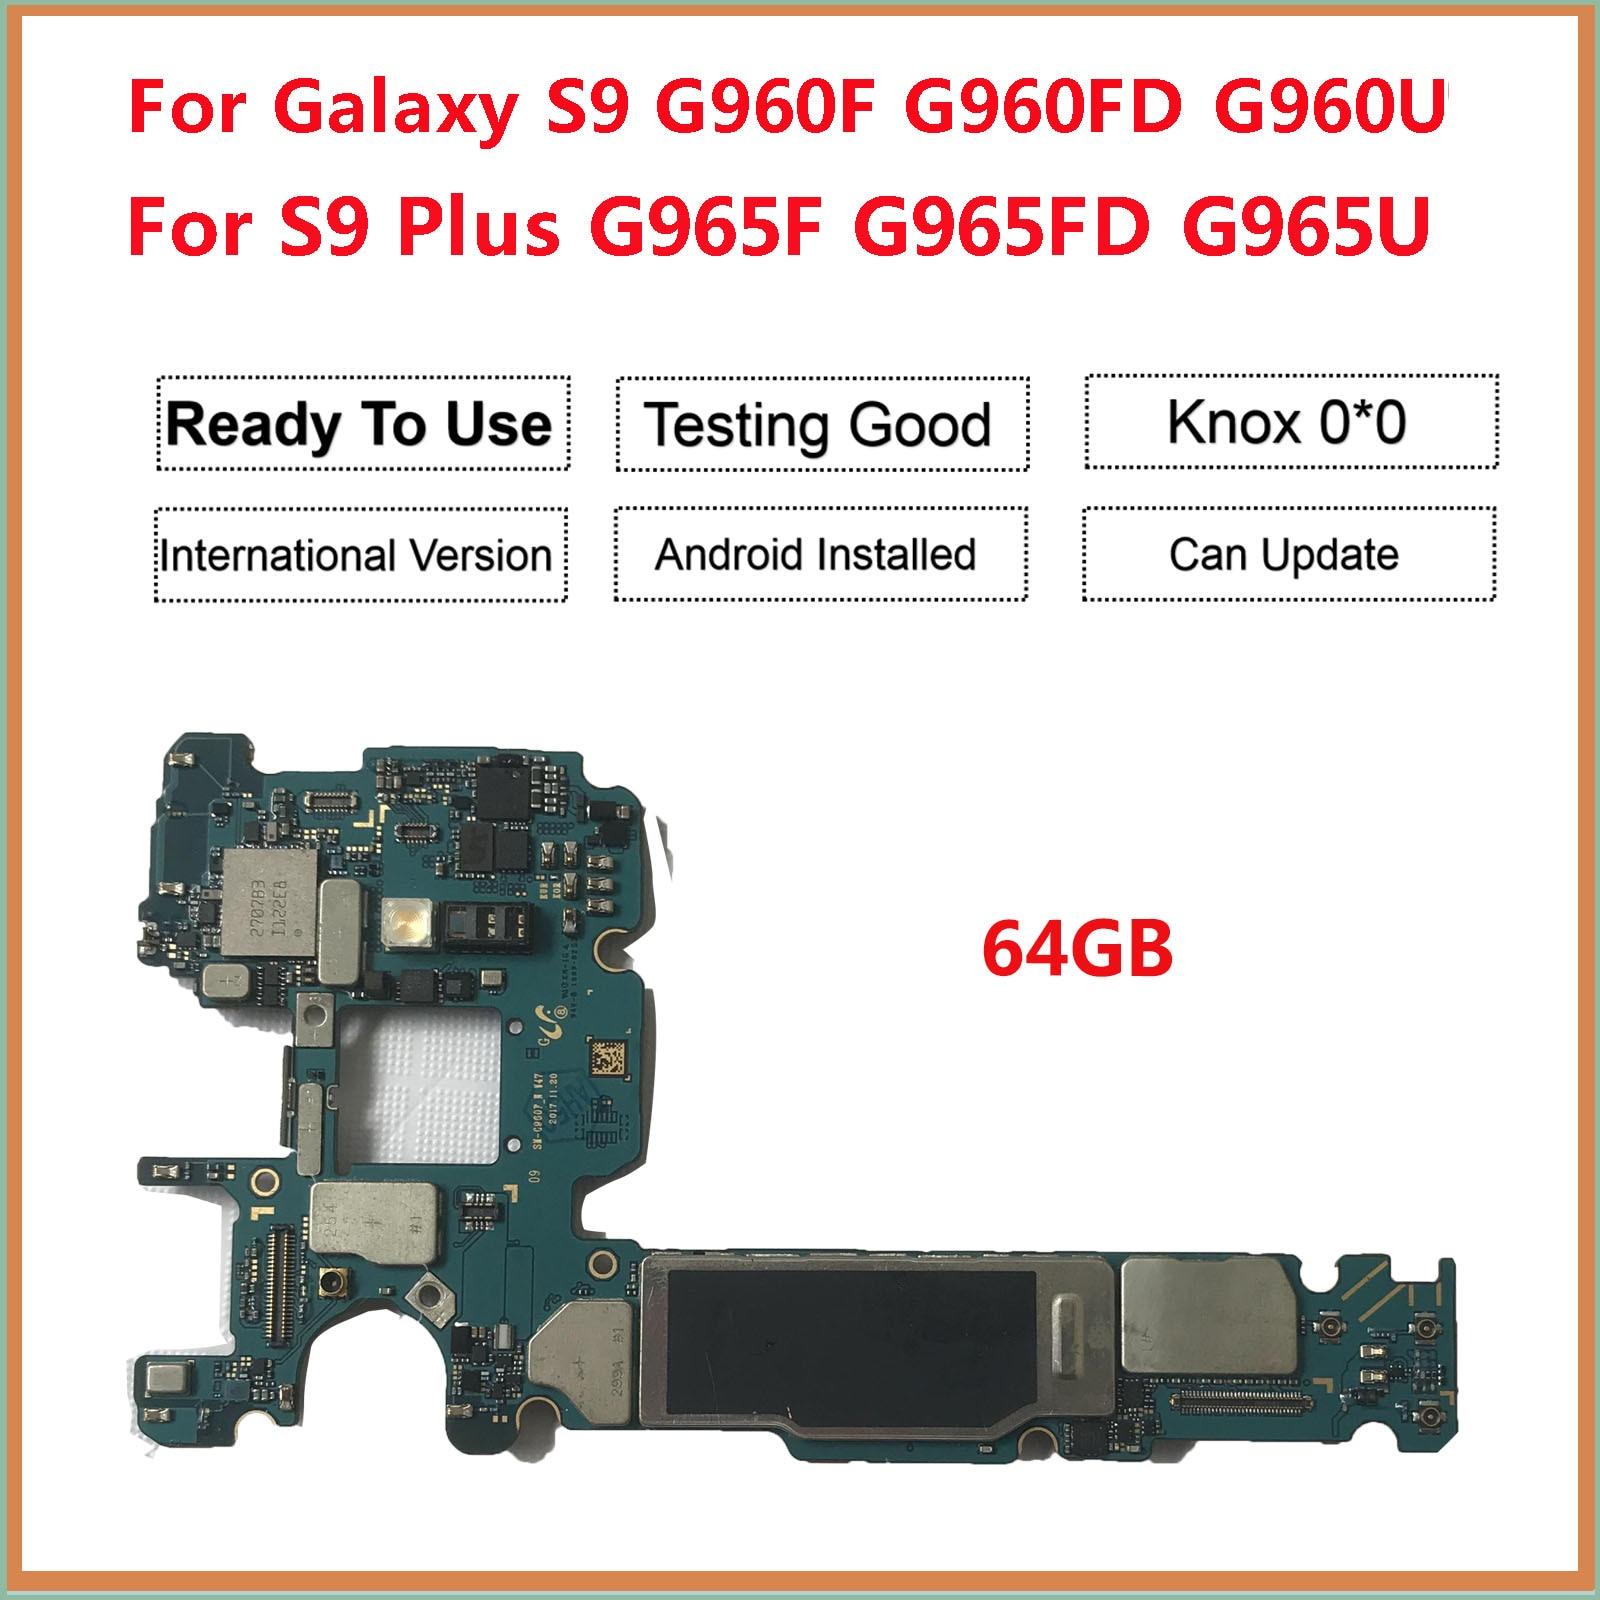 Placa-mãe para samsung galaxy s9 plus/s9 g965f g965fd g960f g960fd 64gb 128gb original desbloqueado android europa placa lógica